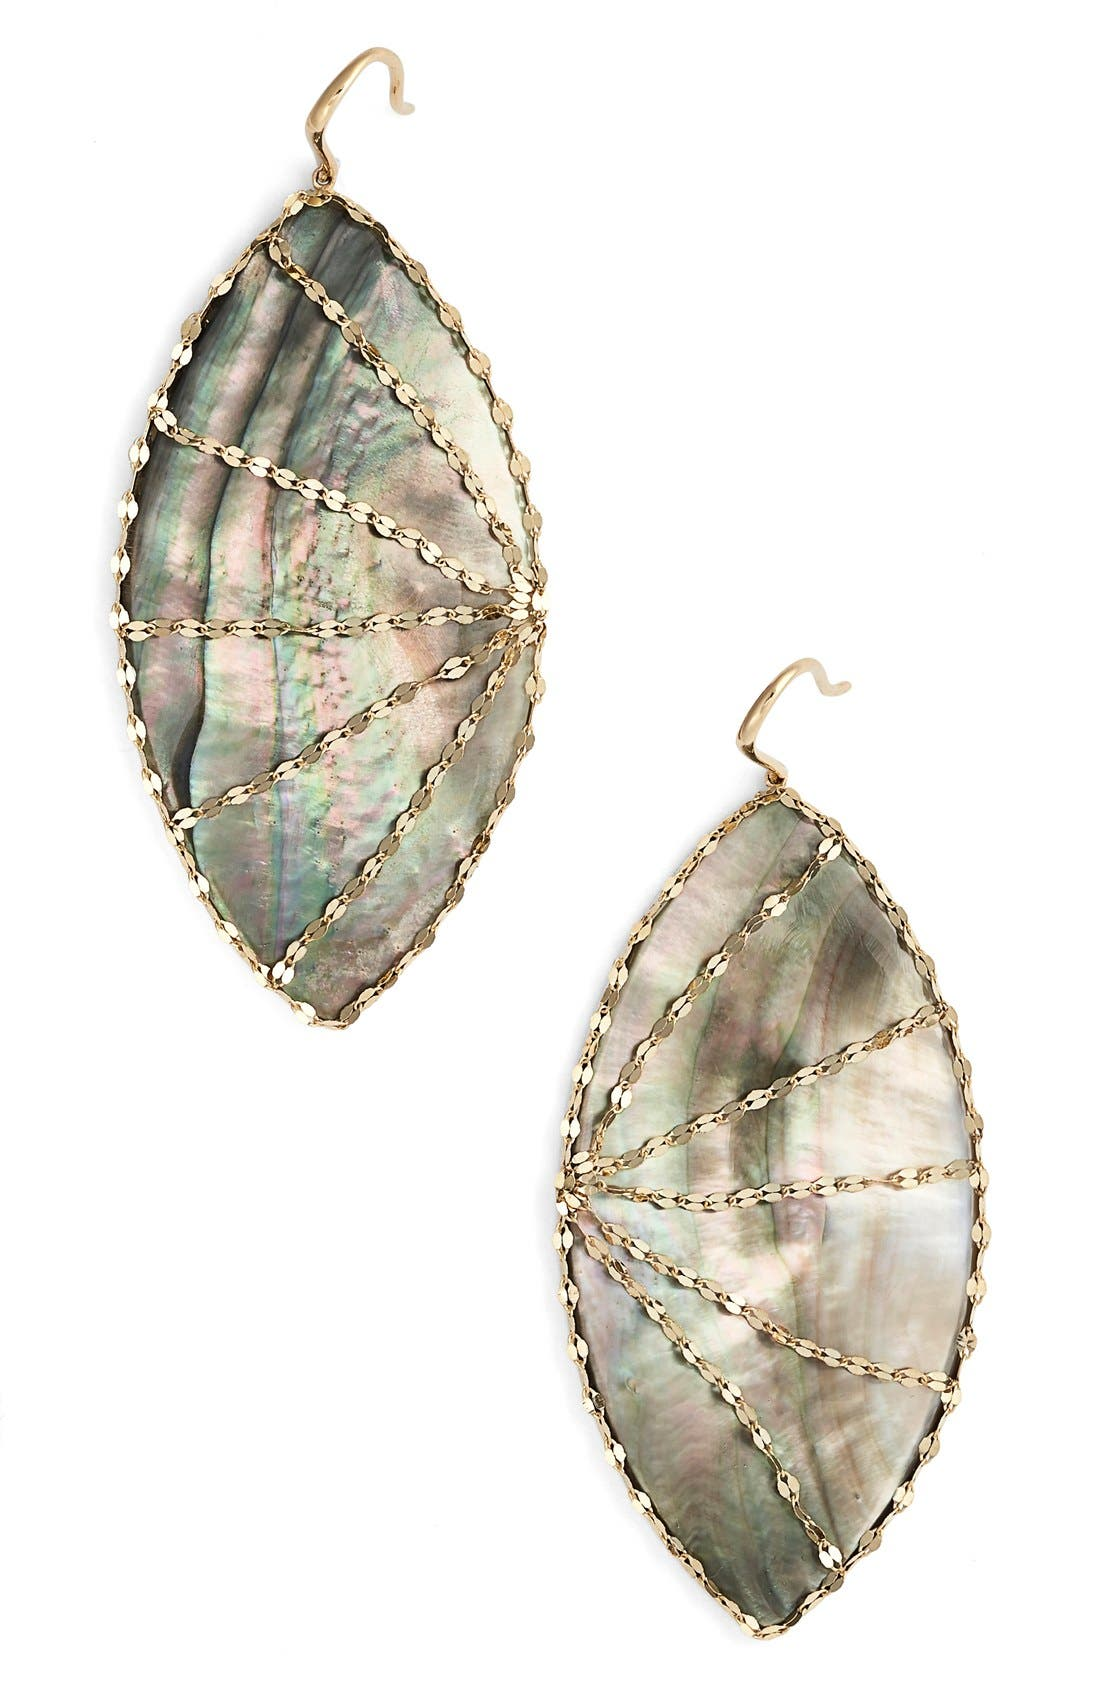 Main Image - LanaJewelry 'MystiqIsabella' Drop Earrings